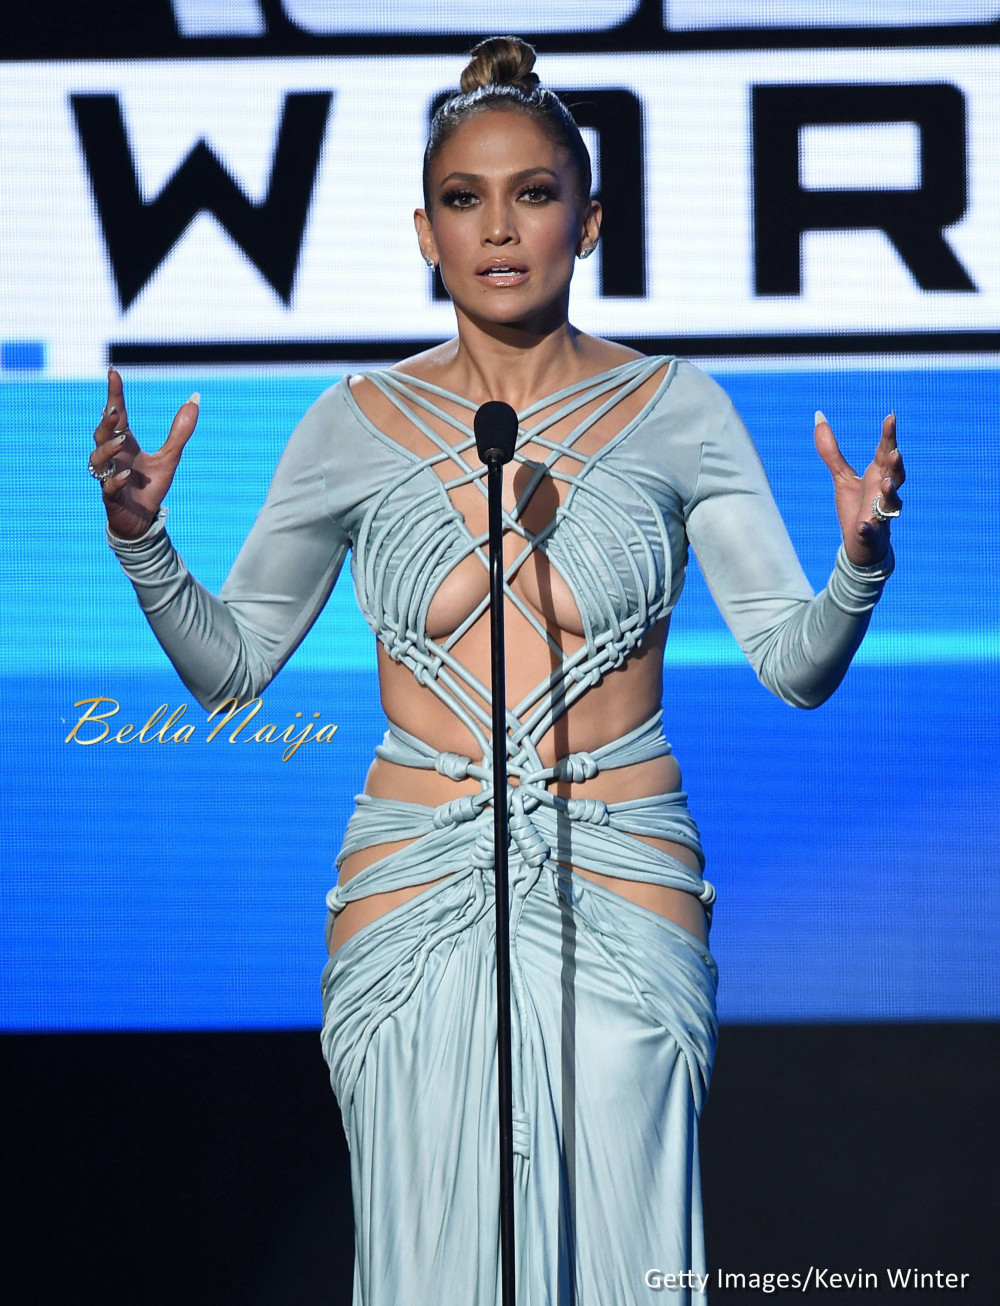 2015 Jennifer Lopez AMA Awards Outfit